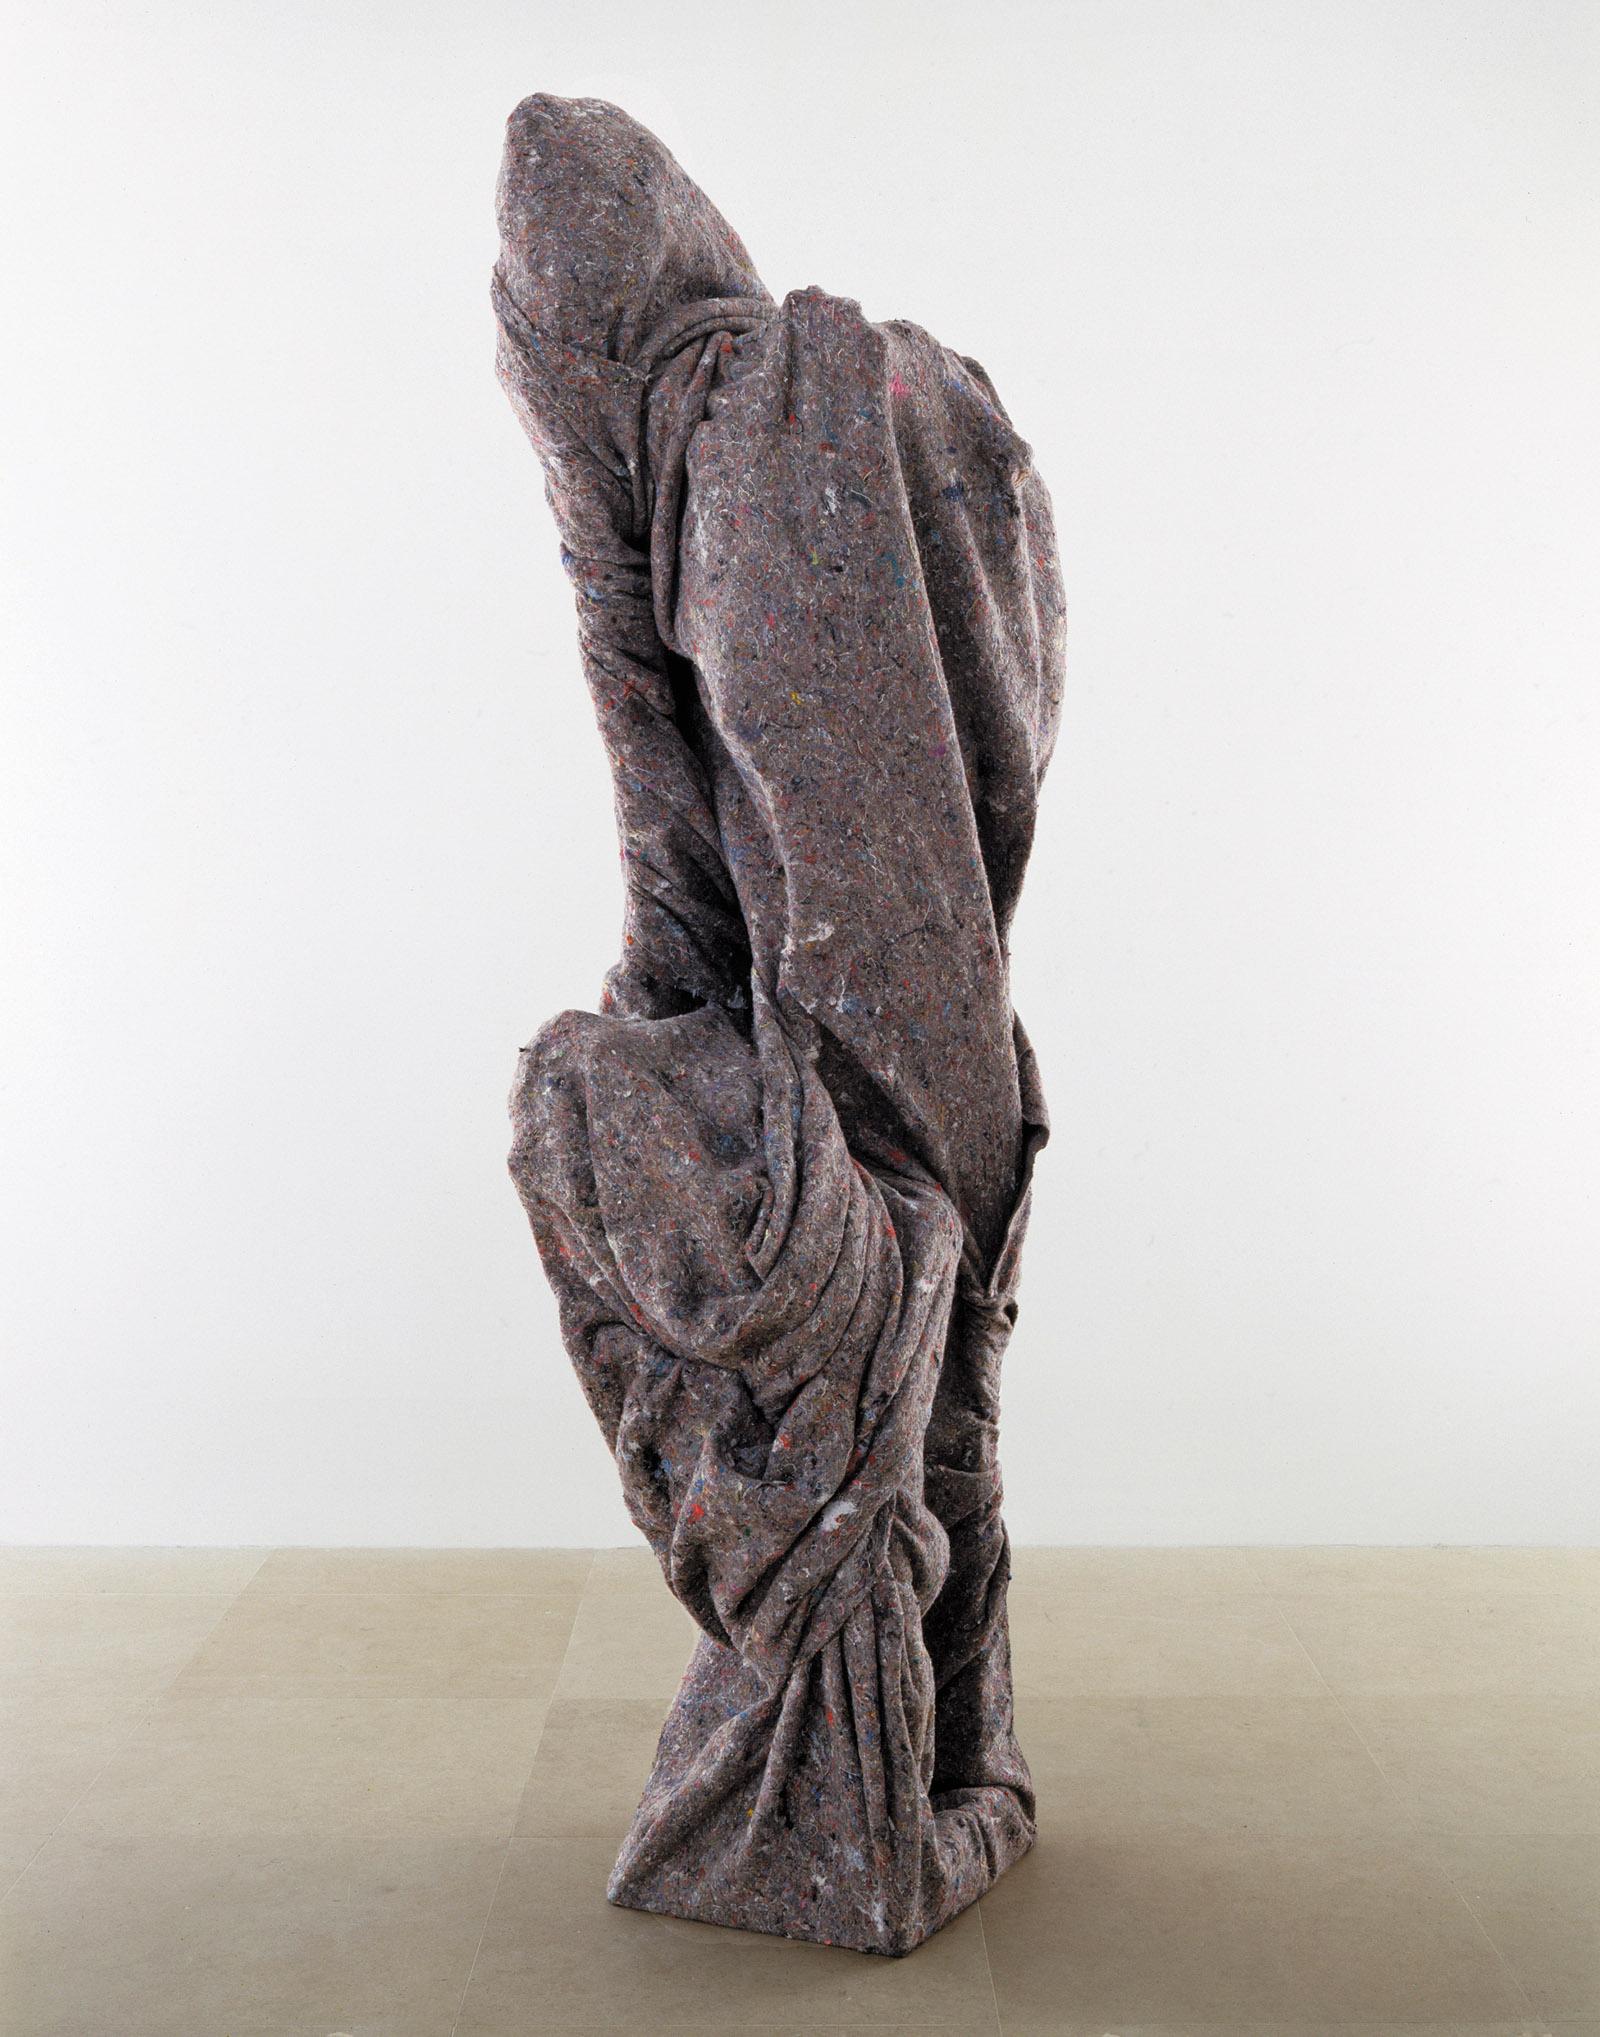 Warren Beatty, 2007; a sculpture by Rachel Harrison